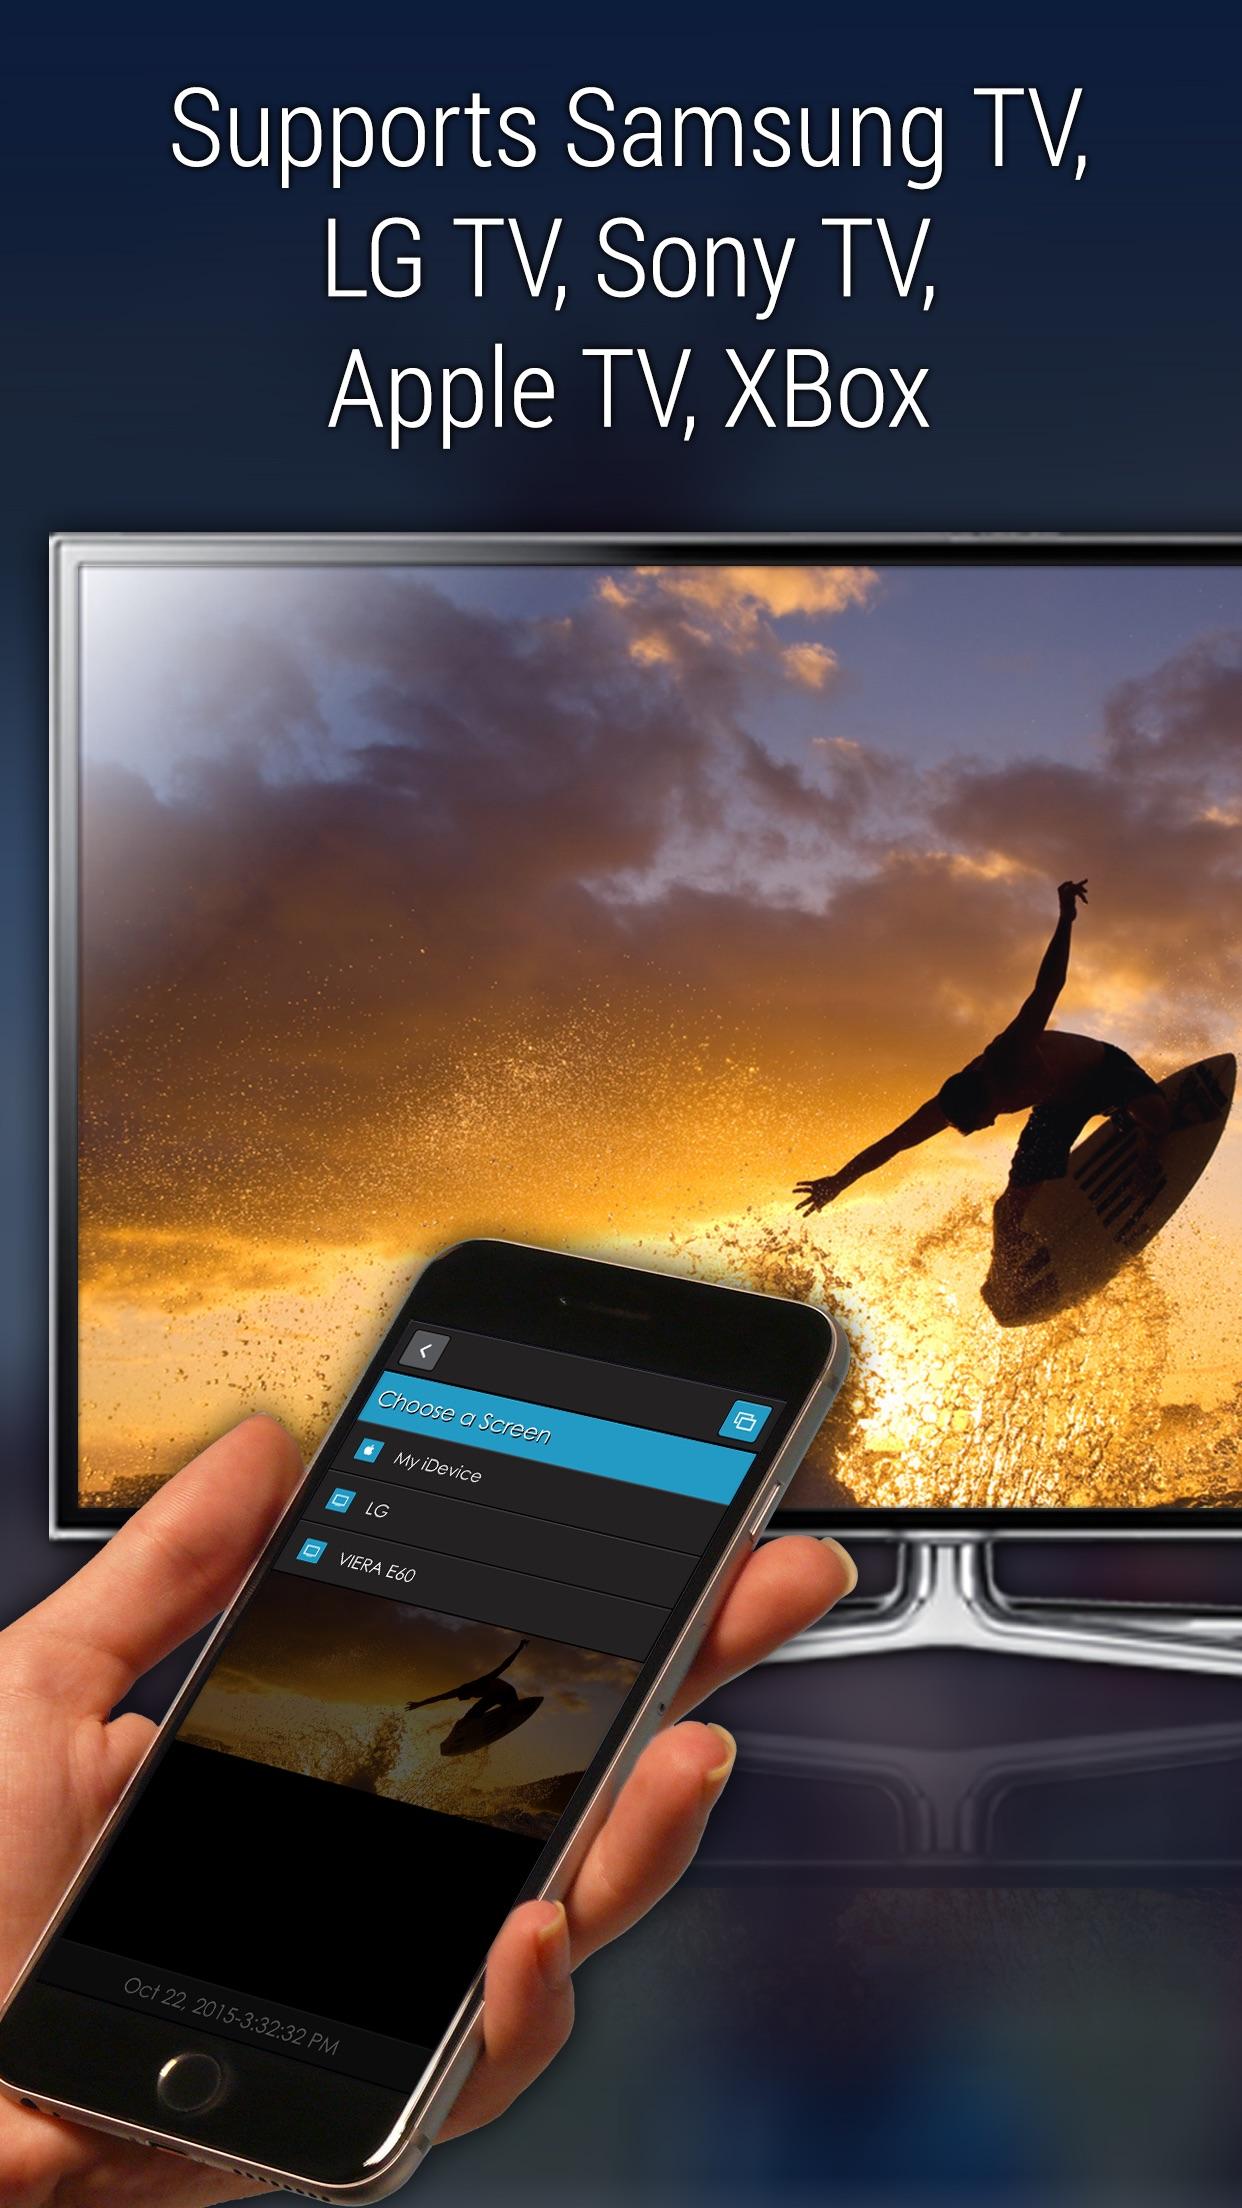 iMediaShare - Stream Photos, Video and Music from your Phone to TV Screenshot